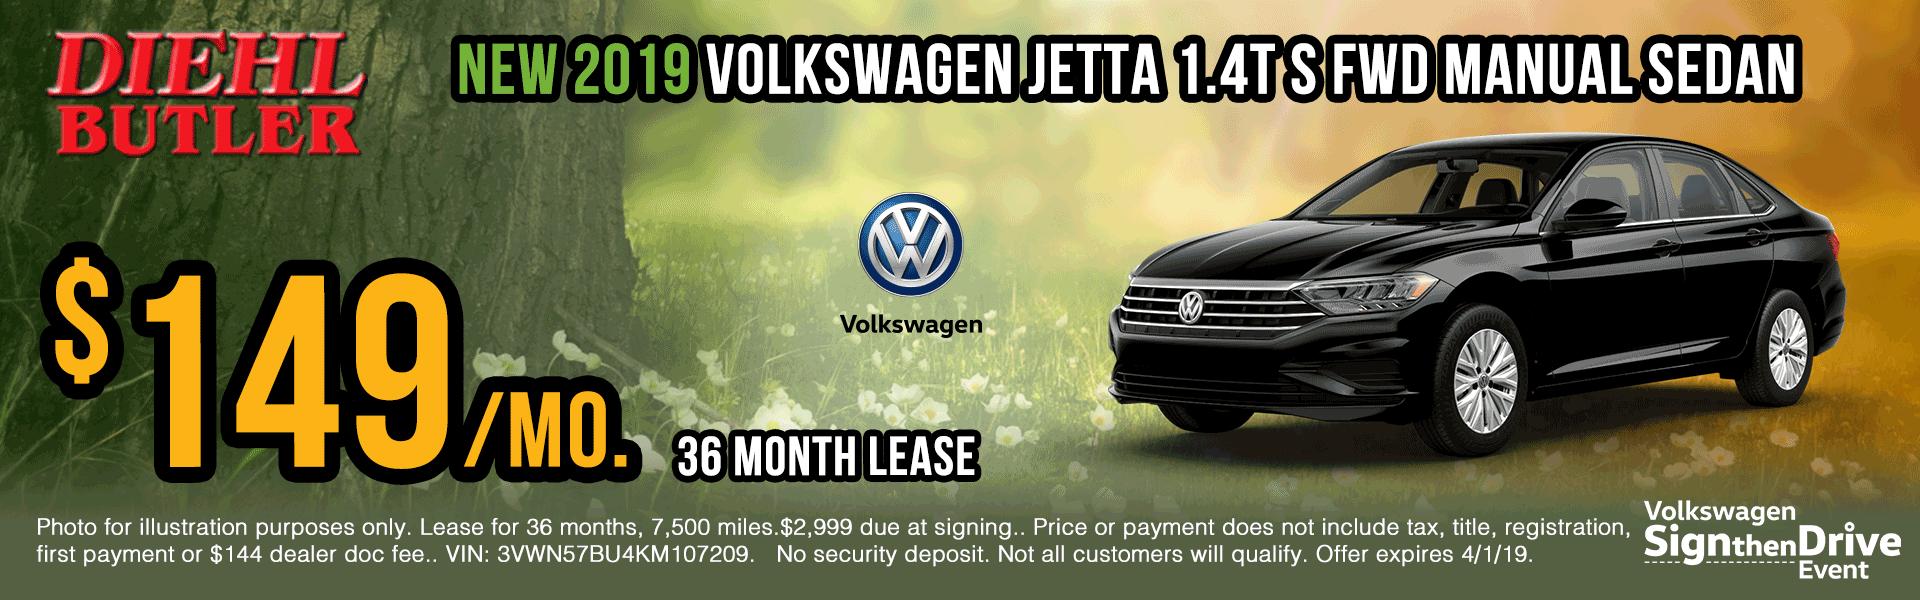 V190112-vw-jetta-manual-sedan sign then drive event Volkswagen specials diehl auto Diehl vw new vehicle specials butler pa